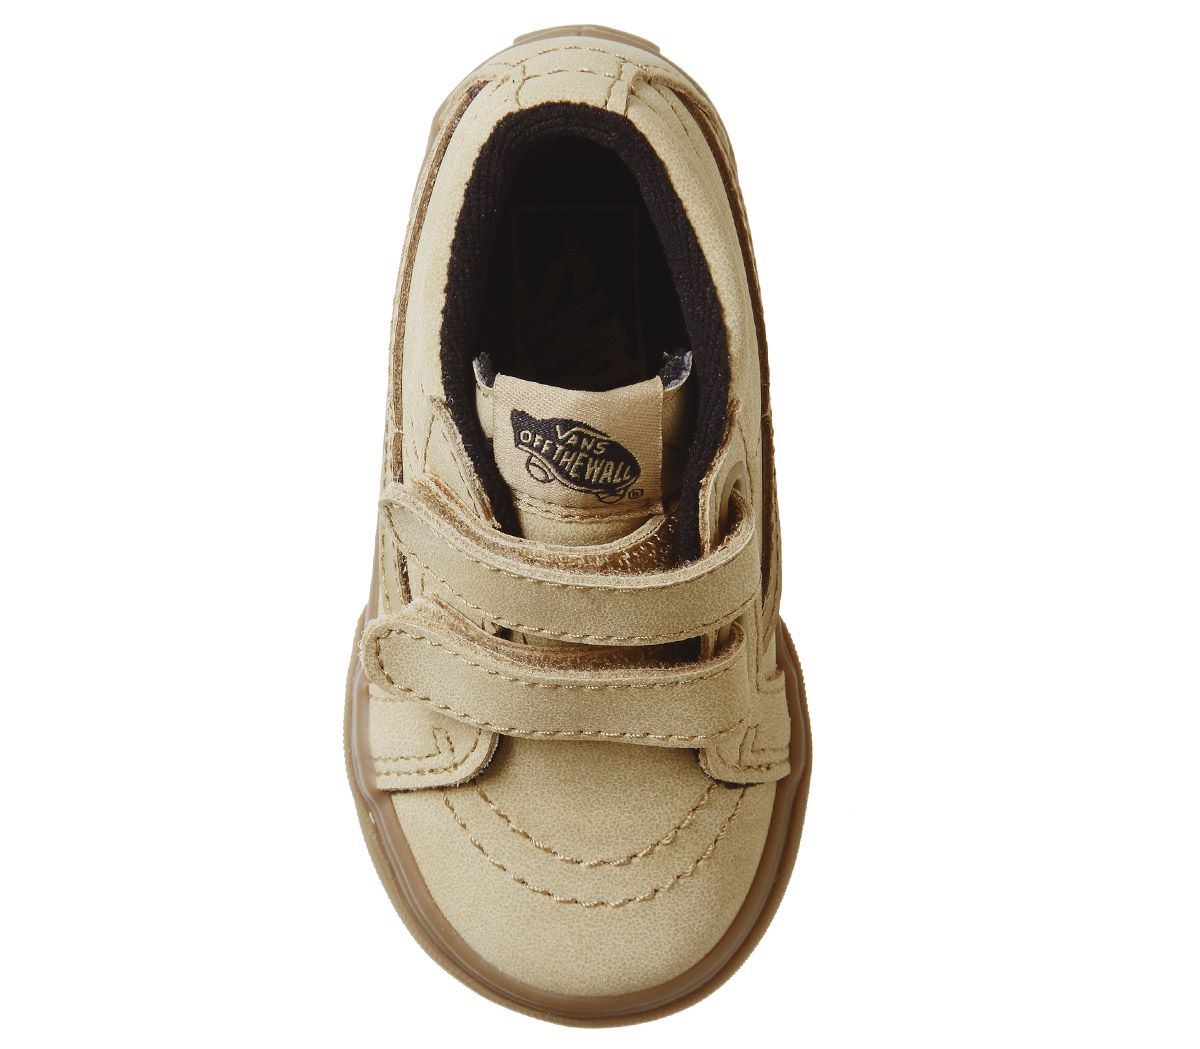 76a18def72b5 Vans Sk8 Mid Reissue Toddler Trainers Vansbuck Apple Cinnamon - Unisex